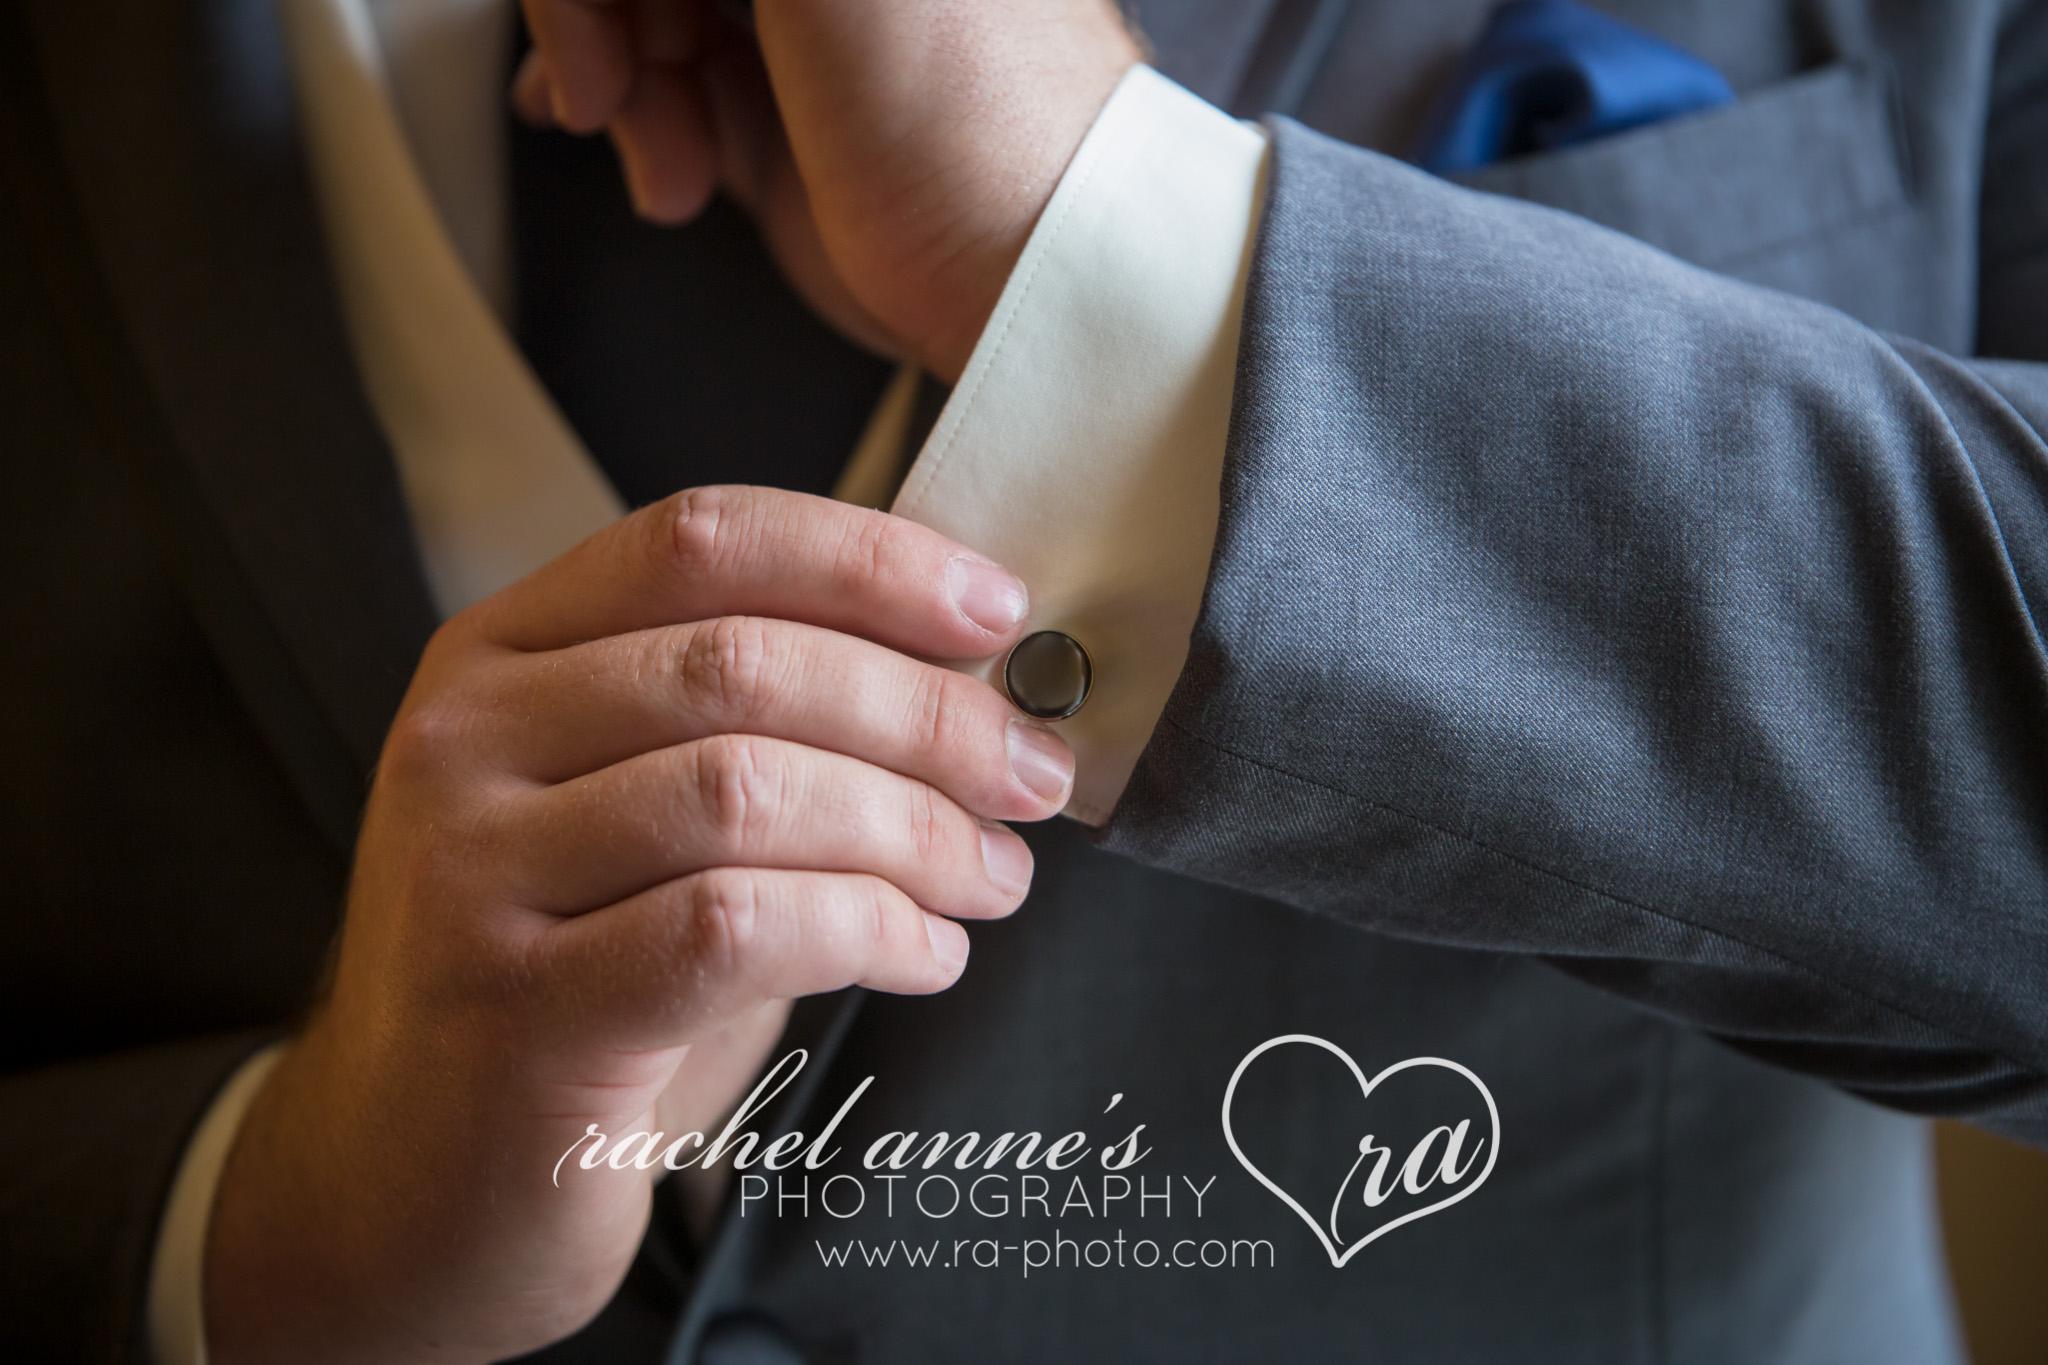 015-JCM-OLD-ECONOMY-VILLAGE-THE-FEZ-PA-WEDDINGS.jpg